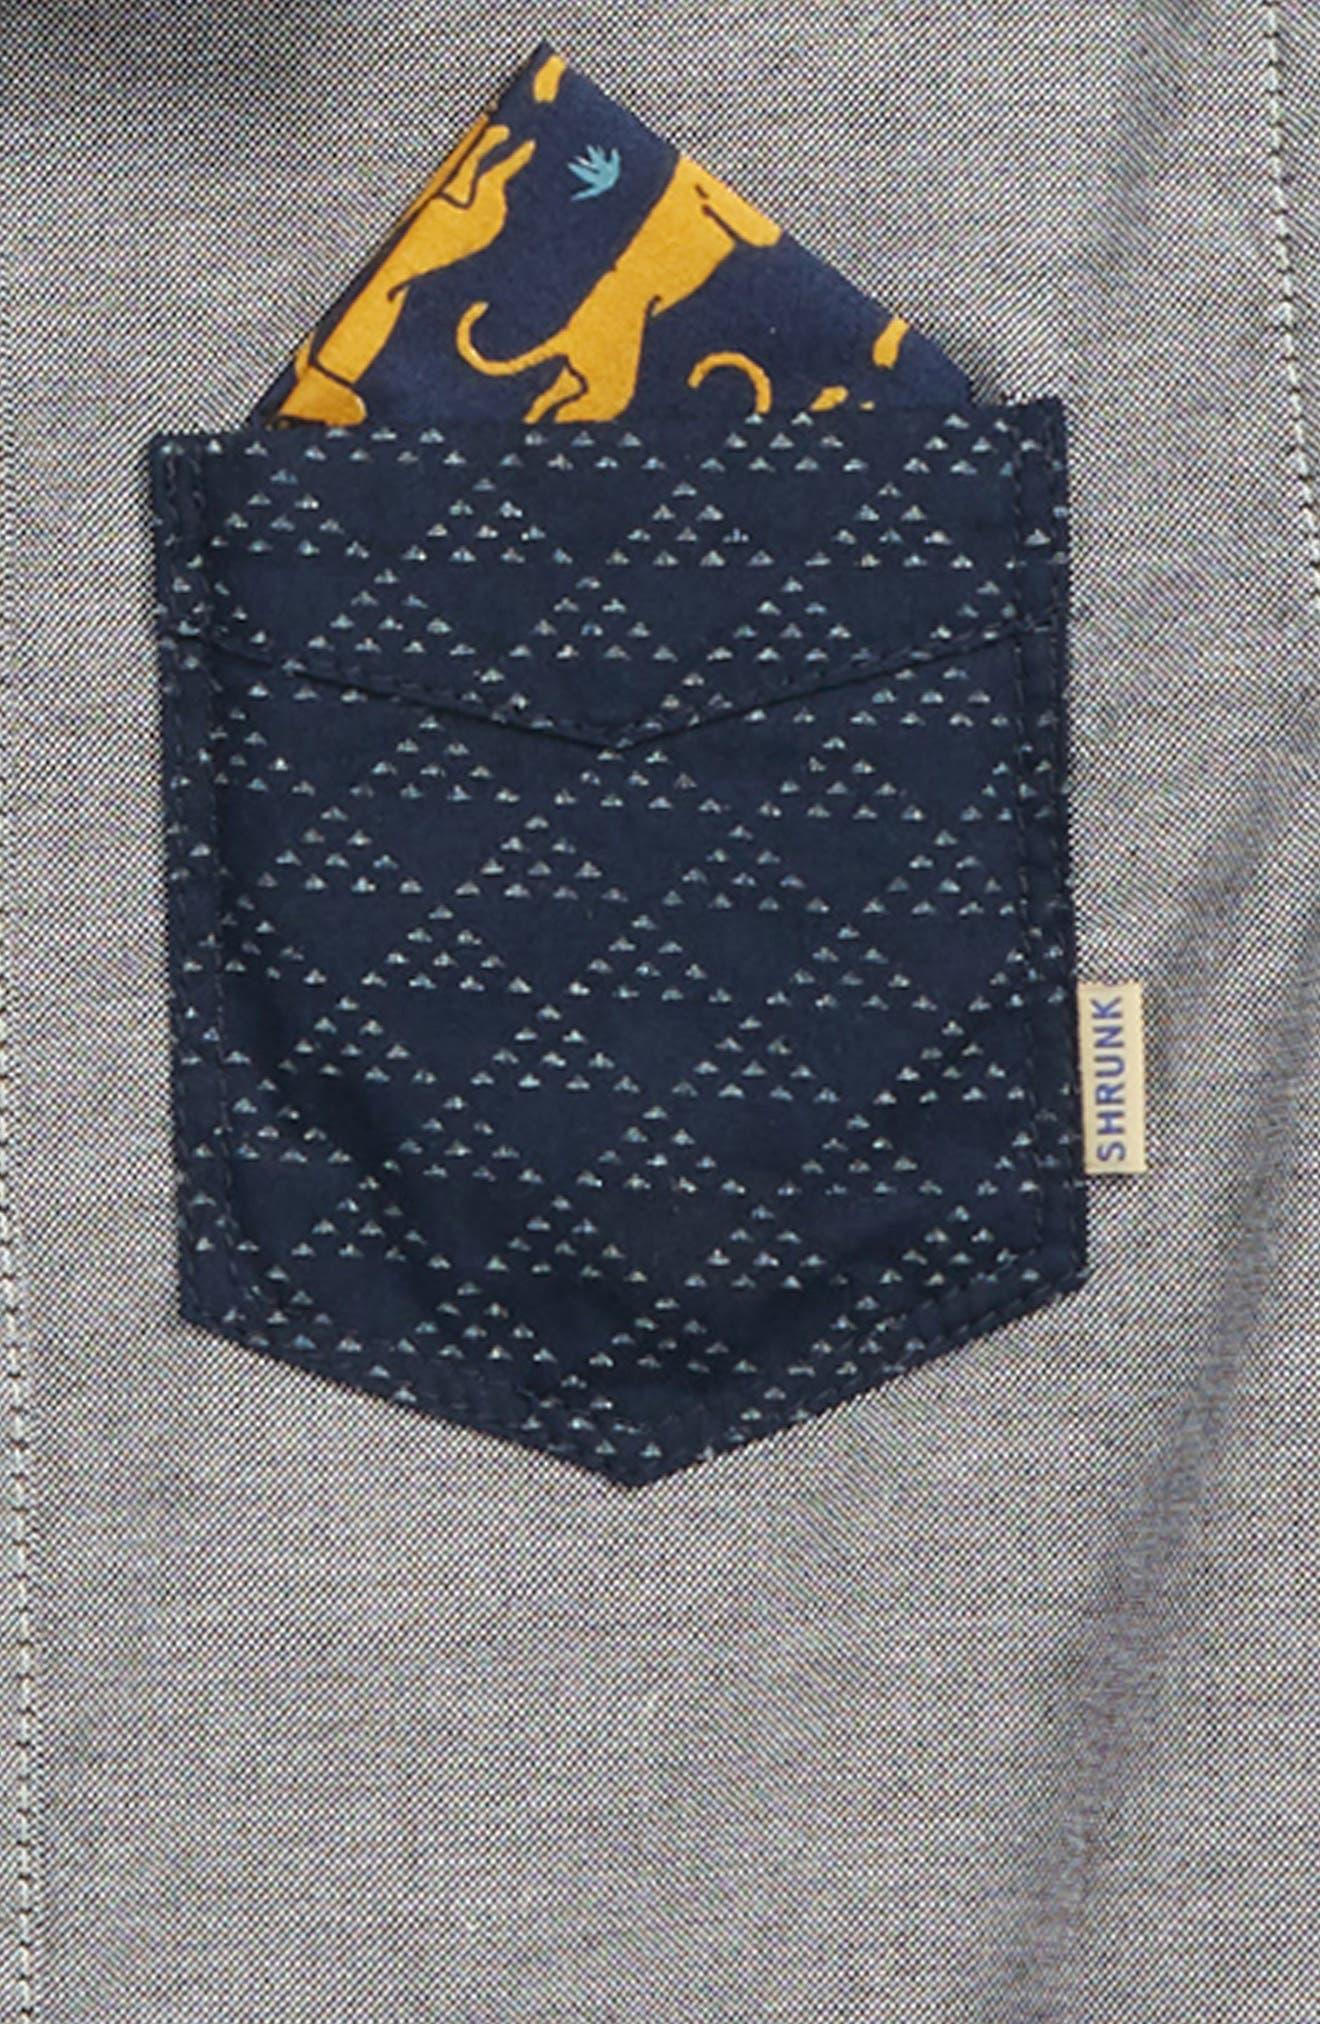 Contrast Pocket Shirt,                             Alternate thumbnail 2, color,                             605 Z